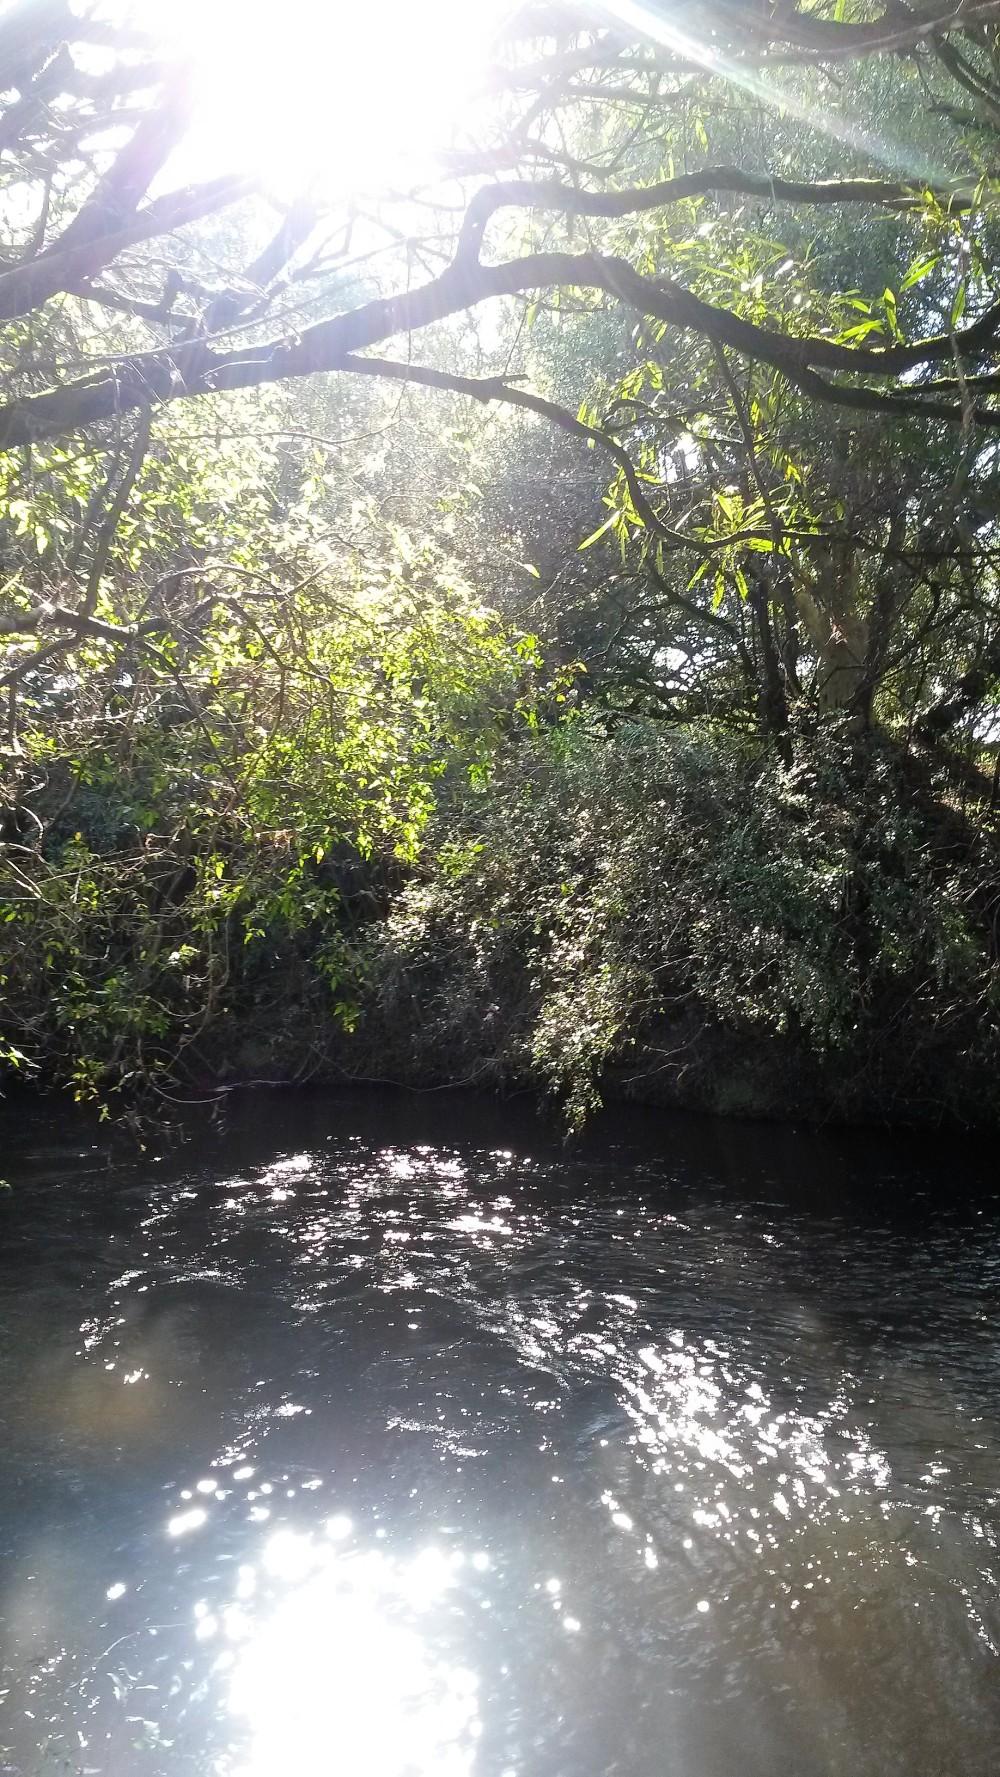 Citas por internet en maçanet de la selva